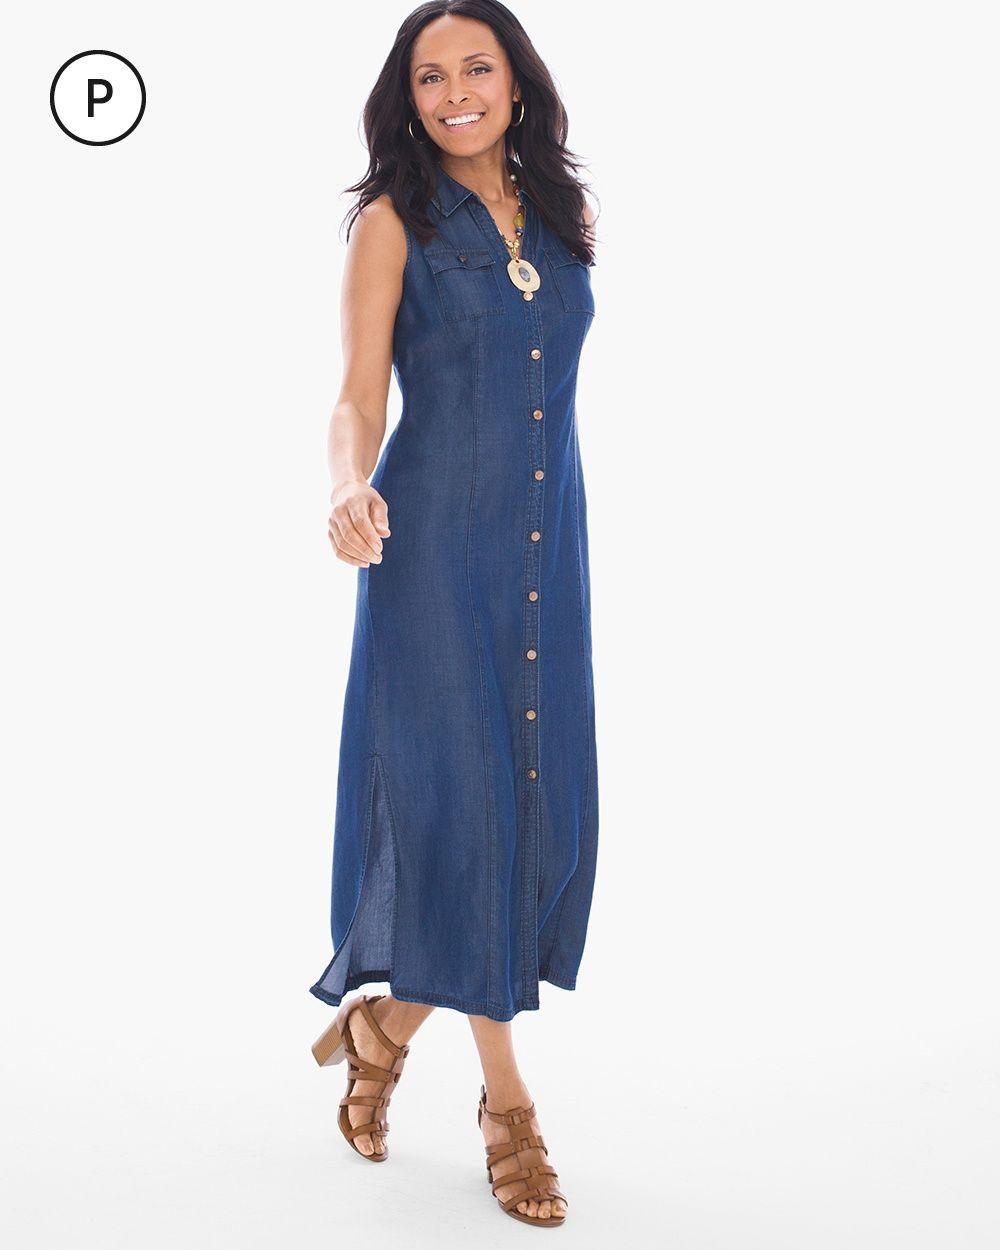 ea28f490be Chico s Women s Petite Chambray Shirt Dress